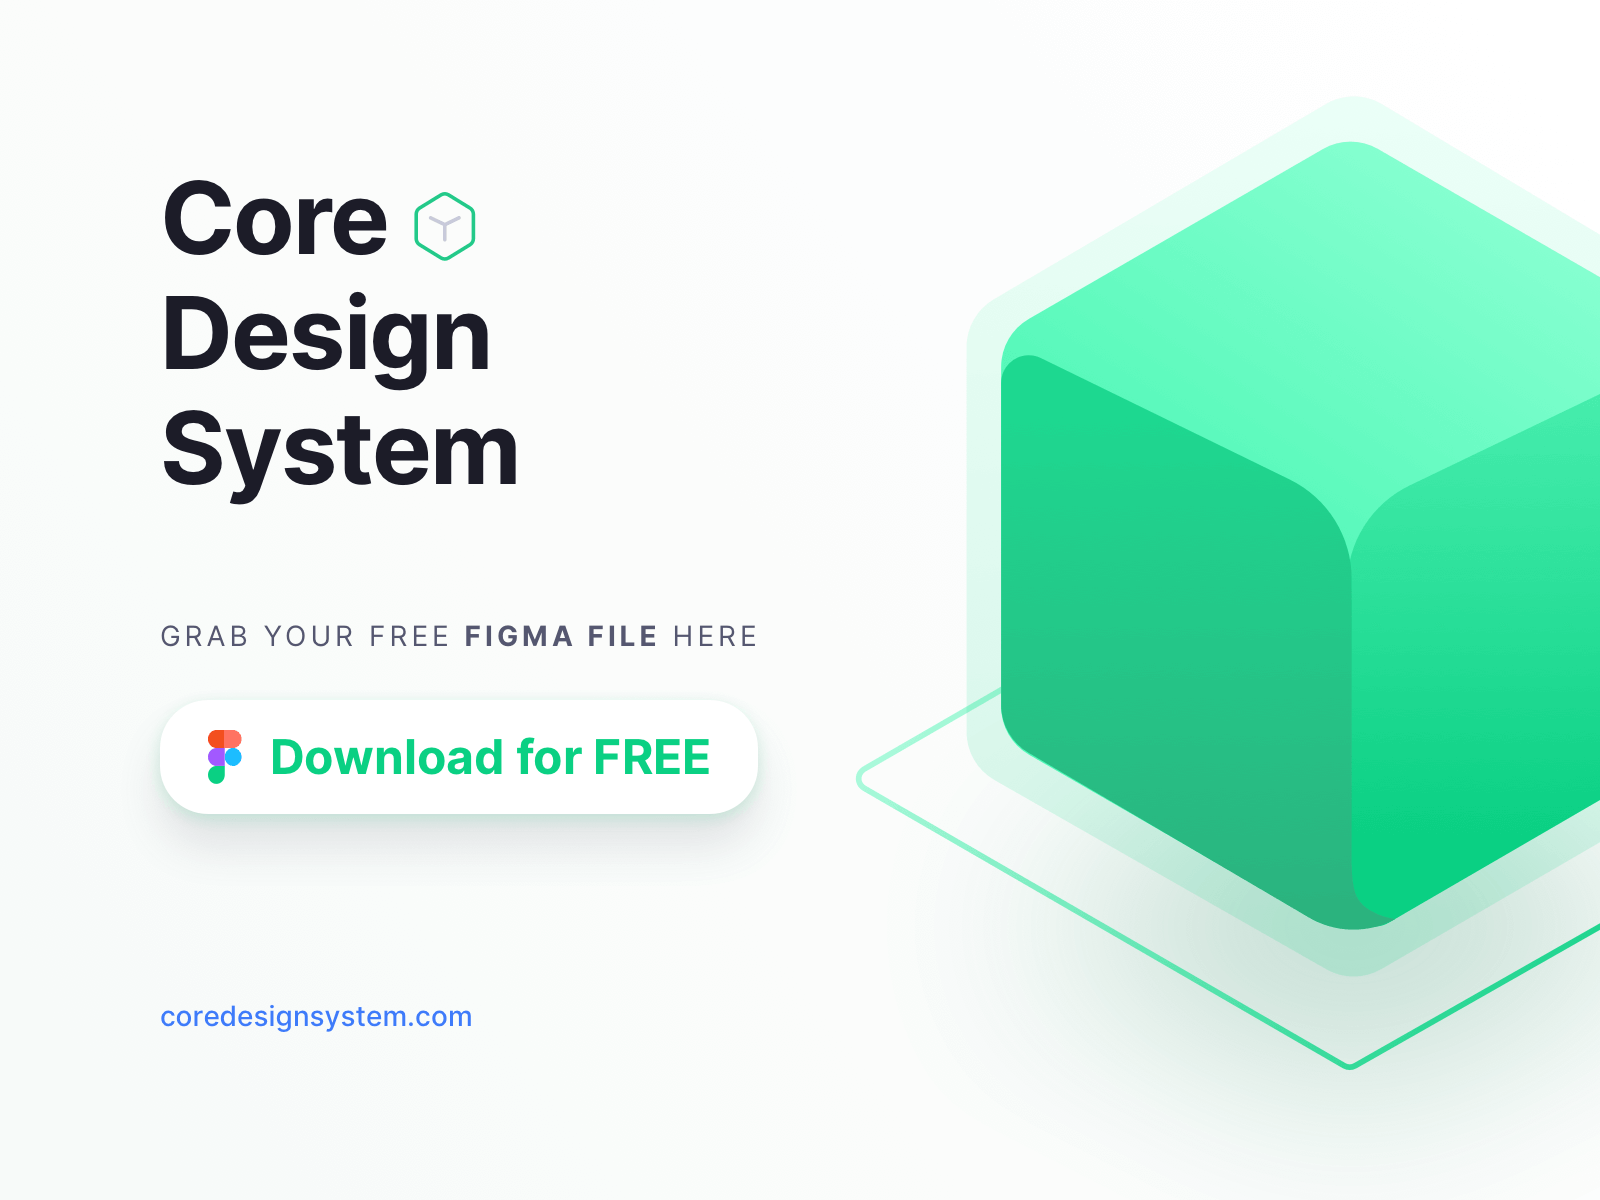 Core Design System - Free Figma File cover image